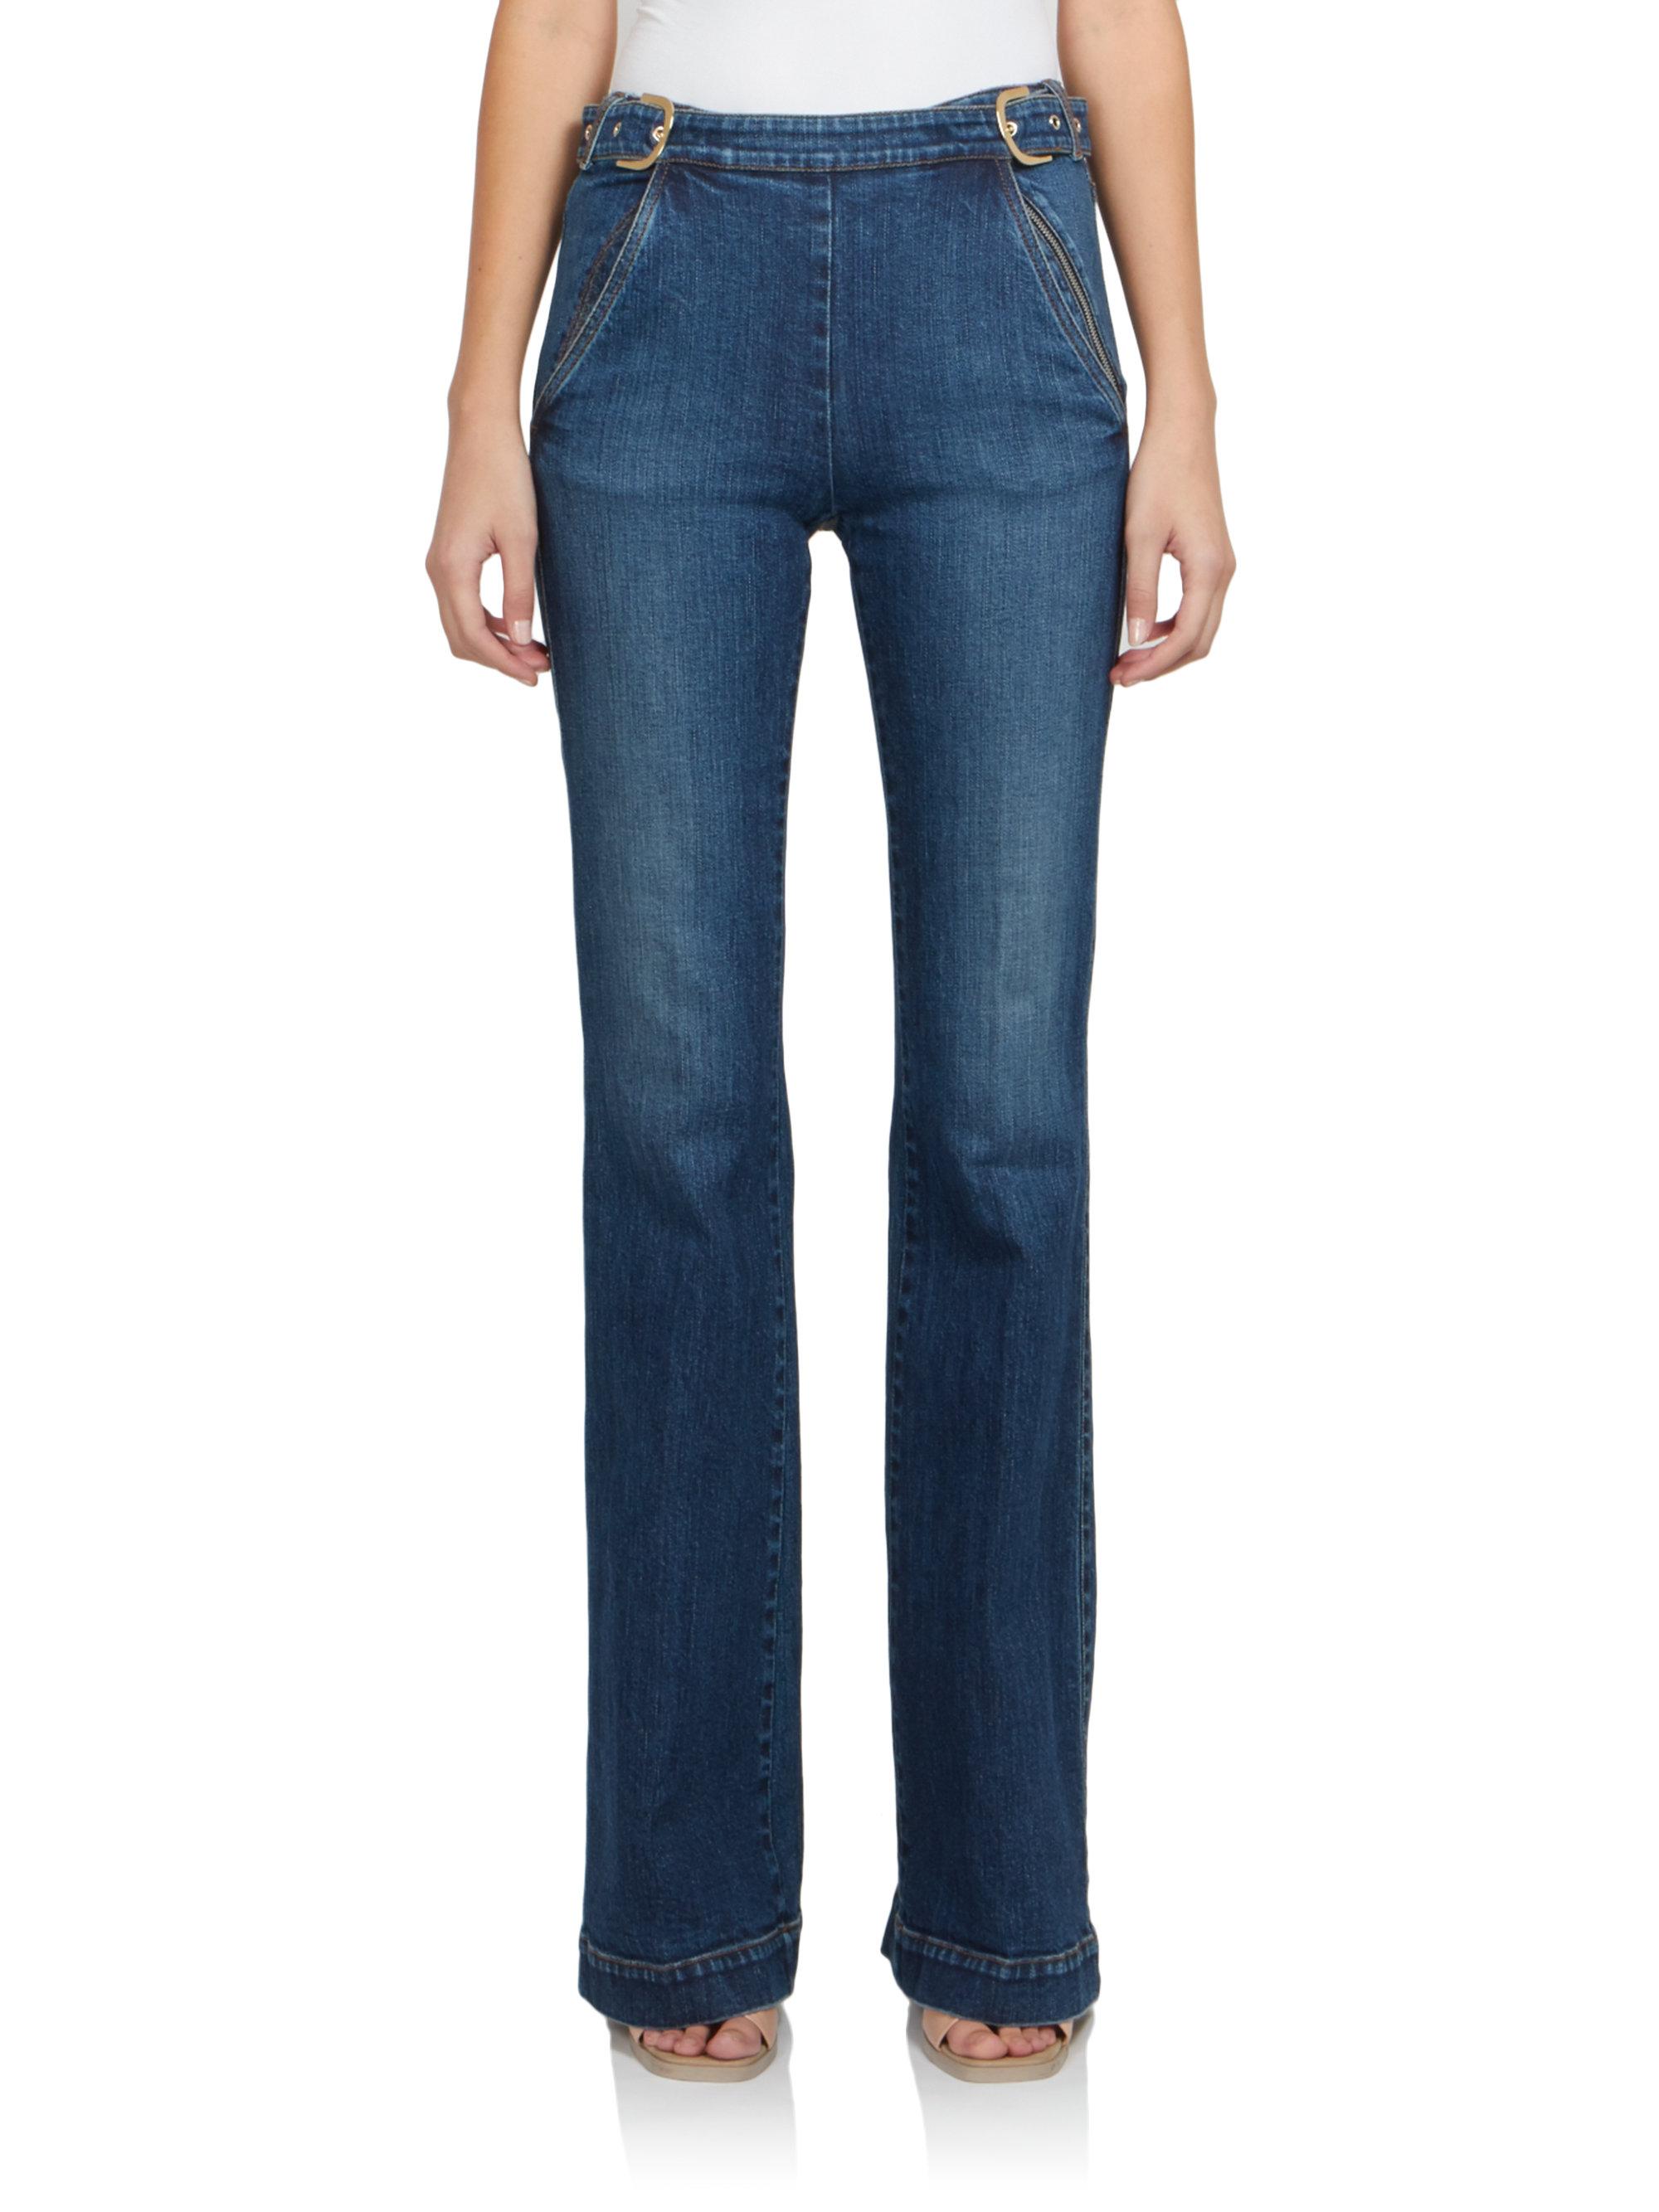 Stella mccartney High-waist Flared Jeans in Blue | Lyst